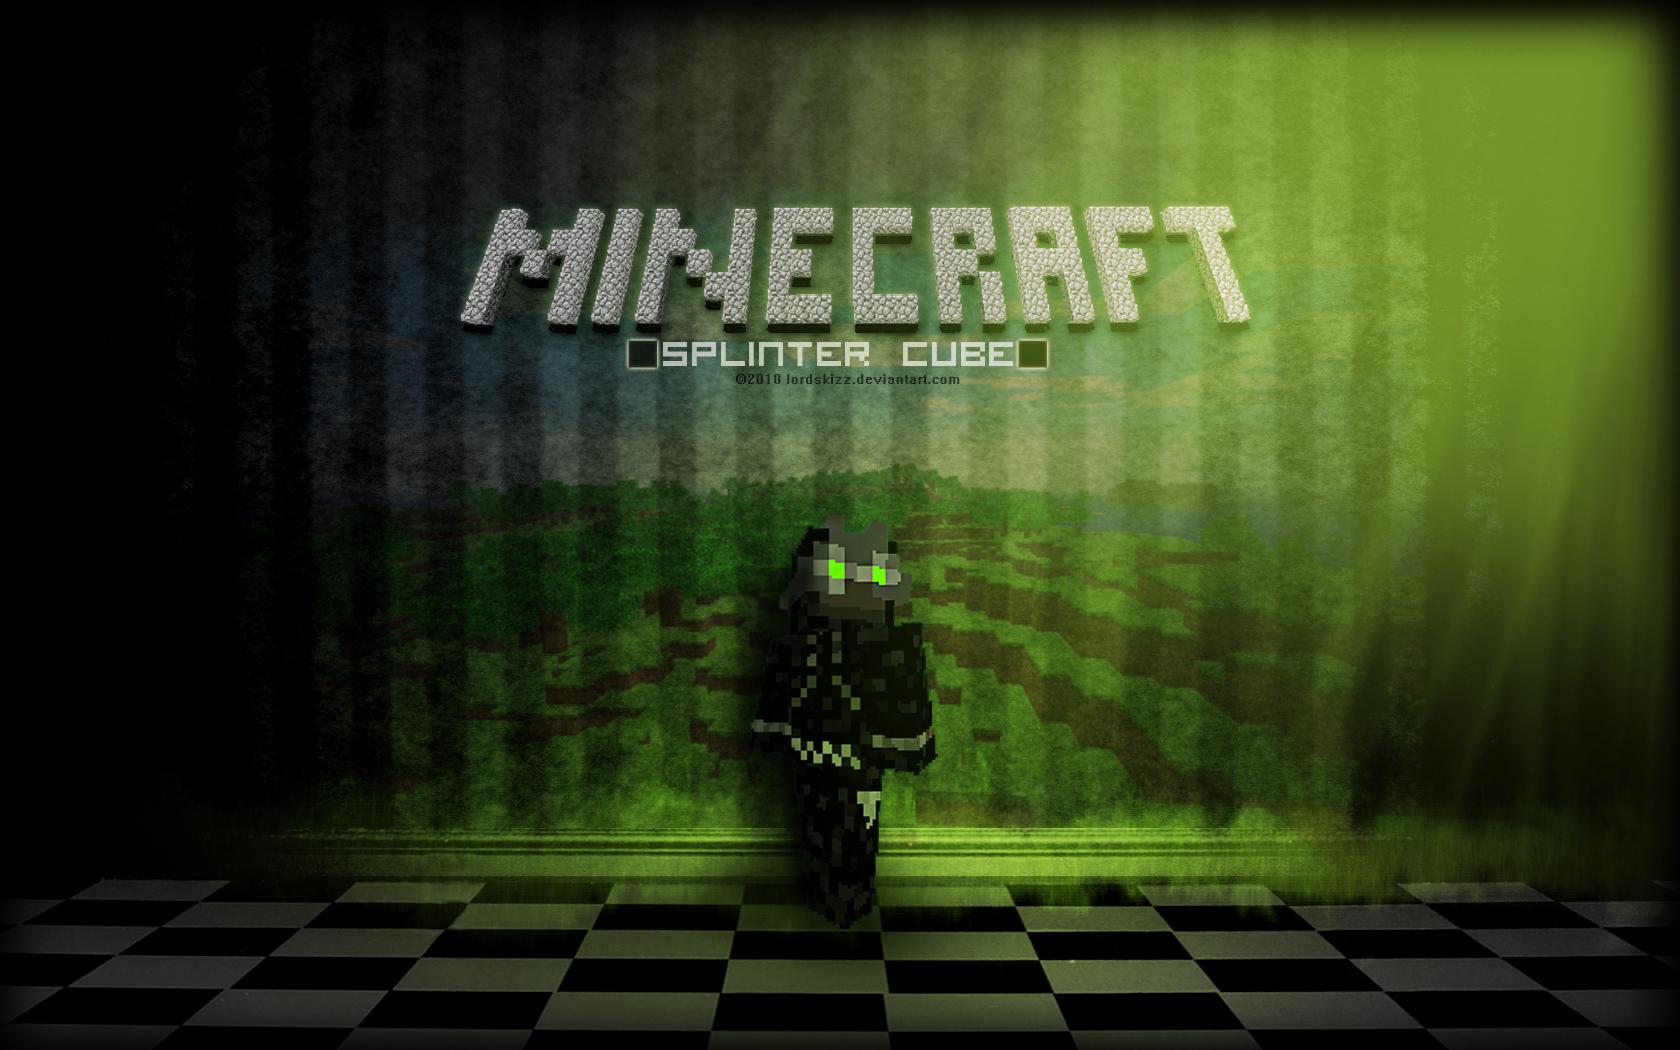 Cool Minecraft Desktop Backgrounds Wallpapers Gallery 1680x1050